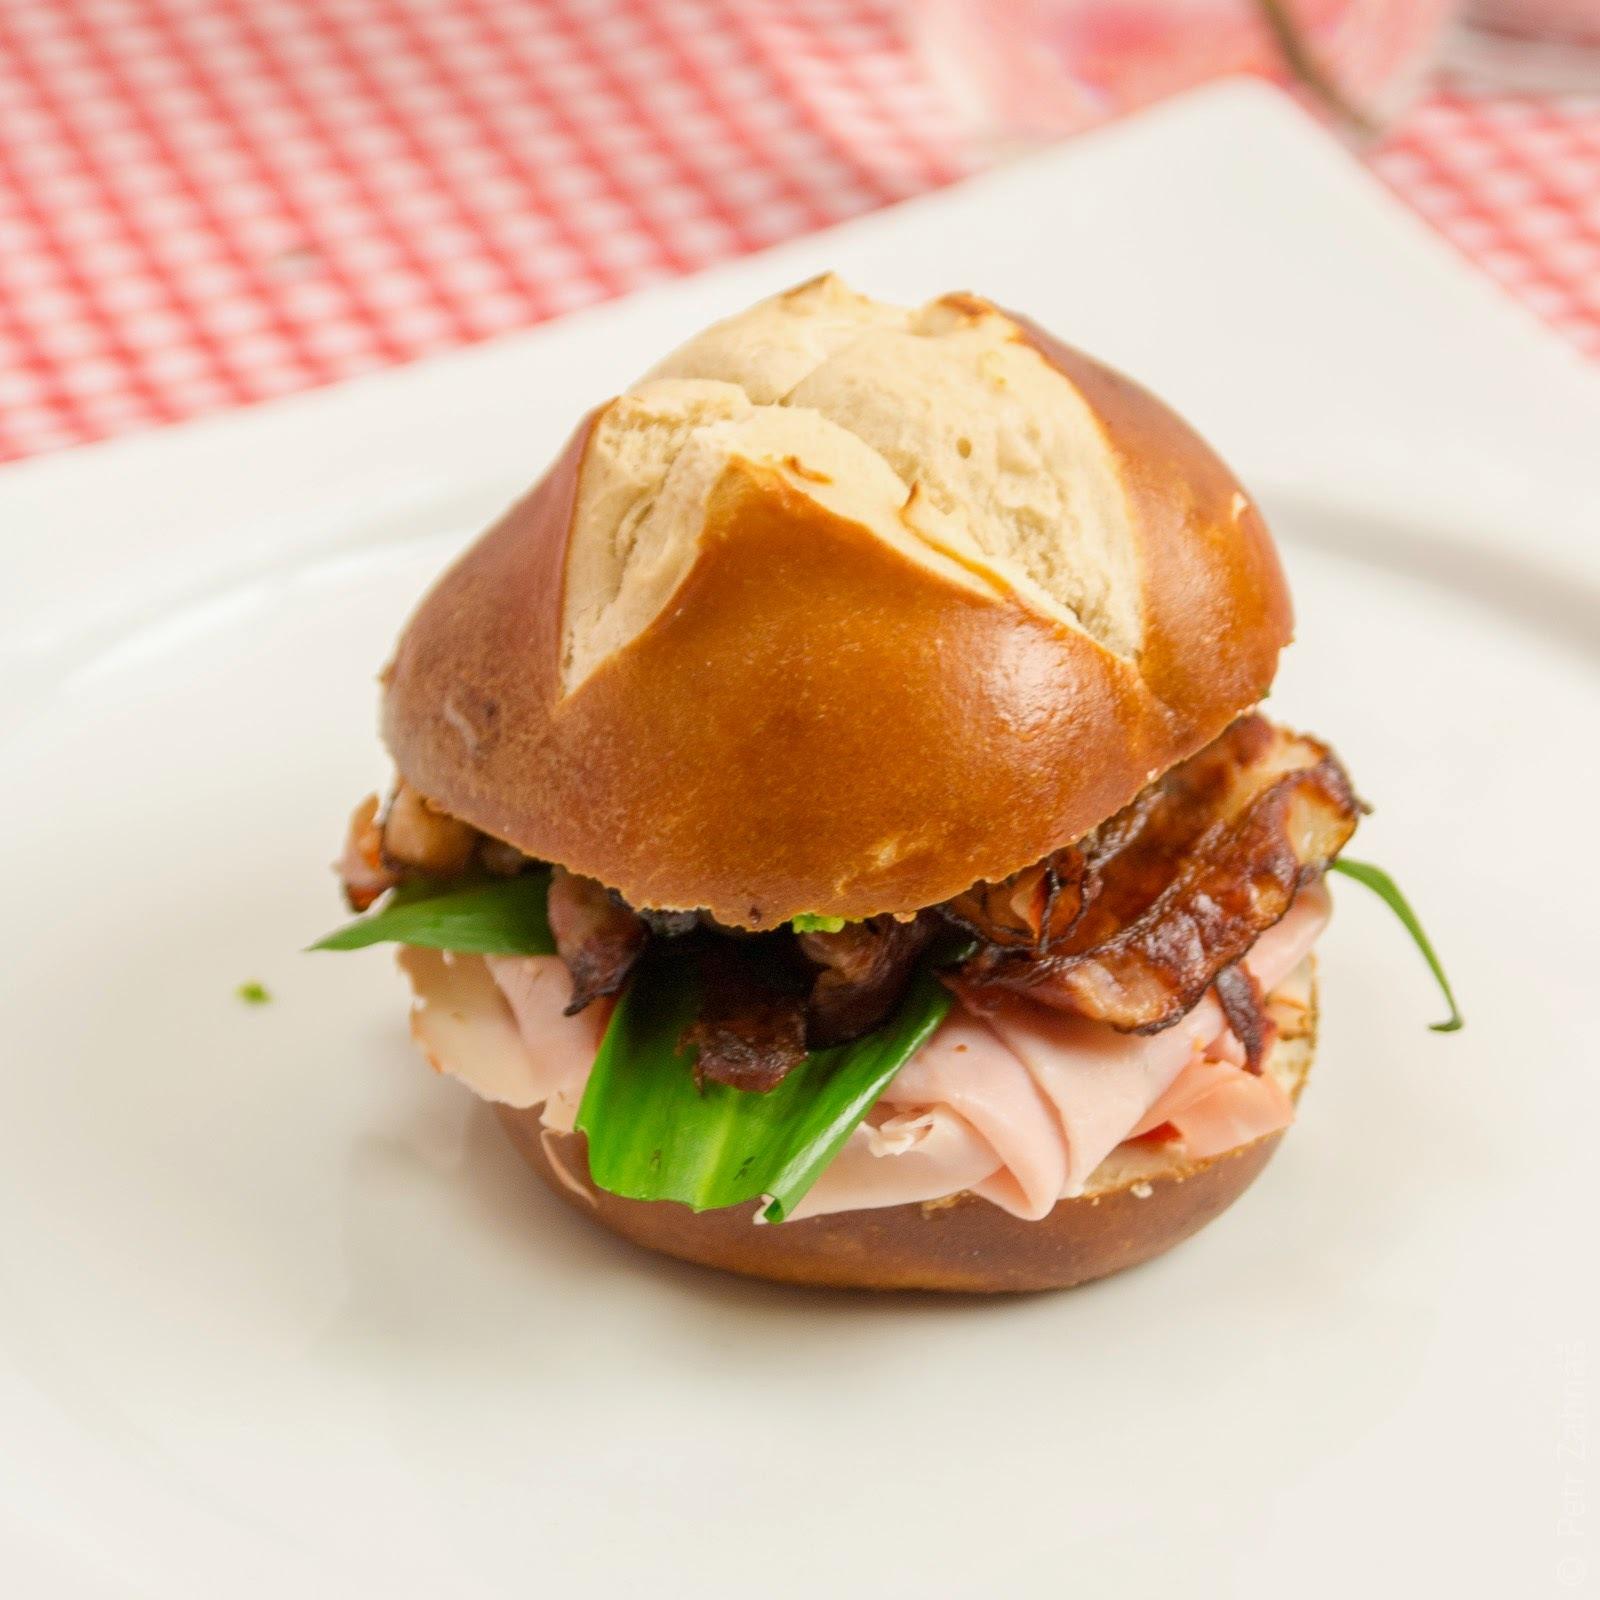 Sandwich match